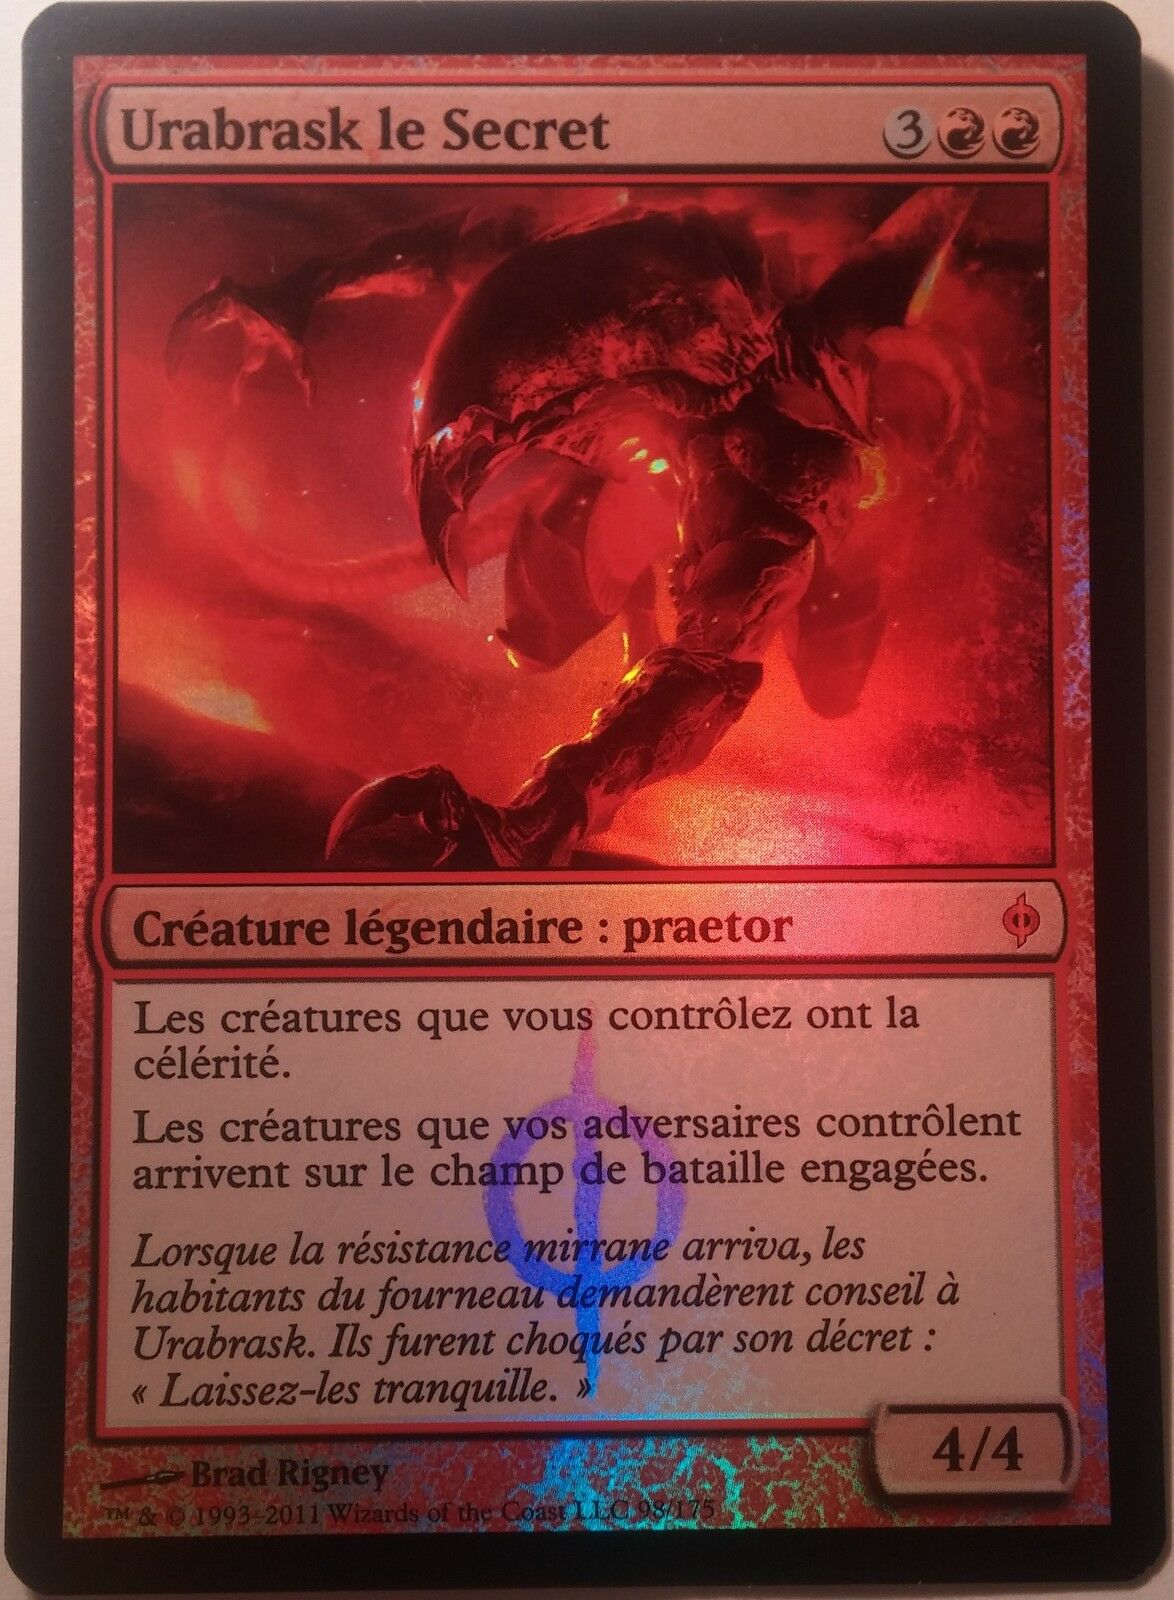 Urabrask le Secret PREMIUM     FOIL VF - French Urabrask the Hidden - Magic mtg - 7504fa